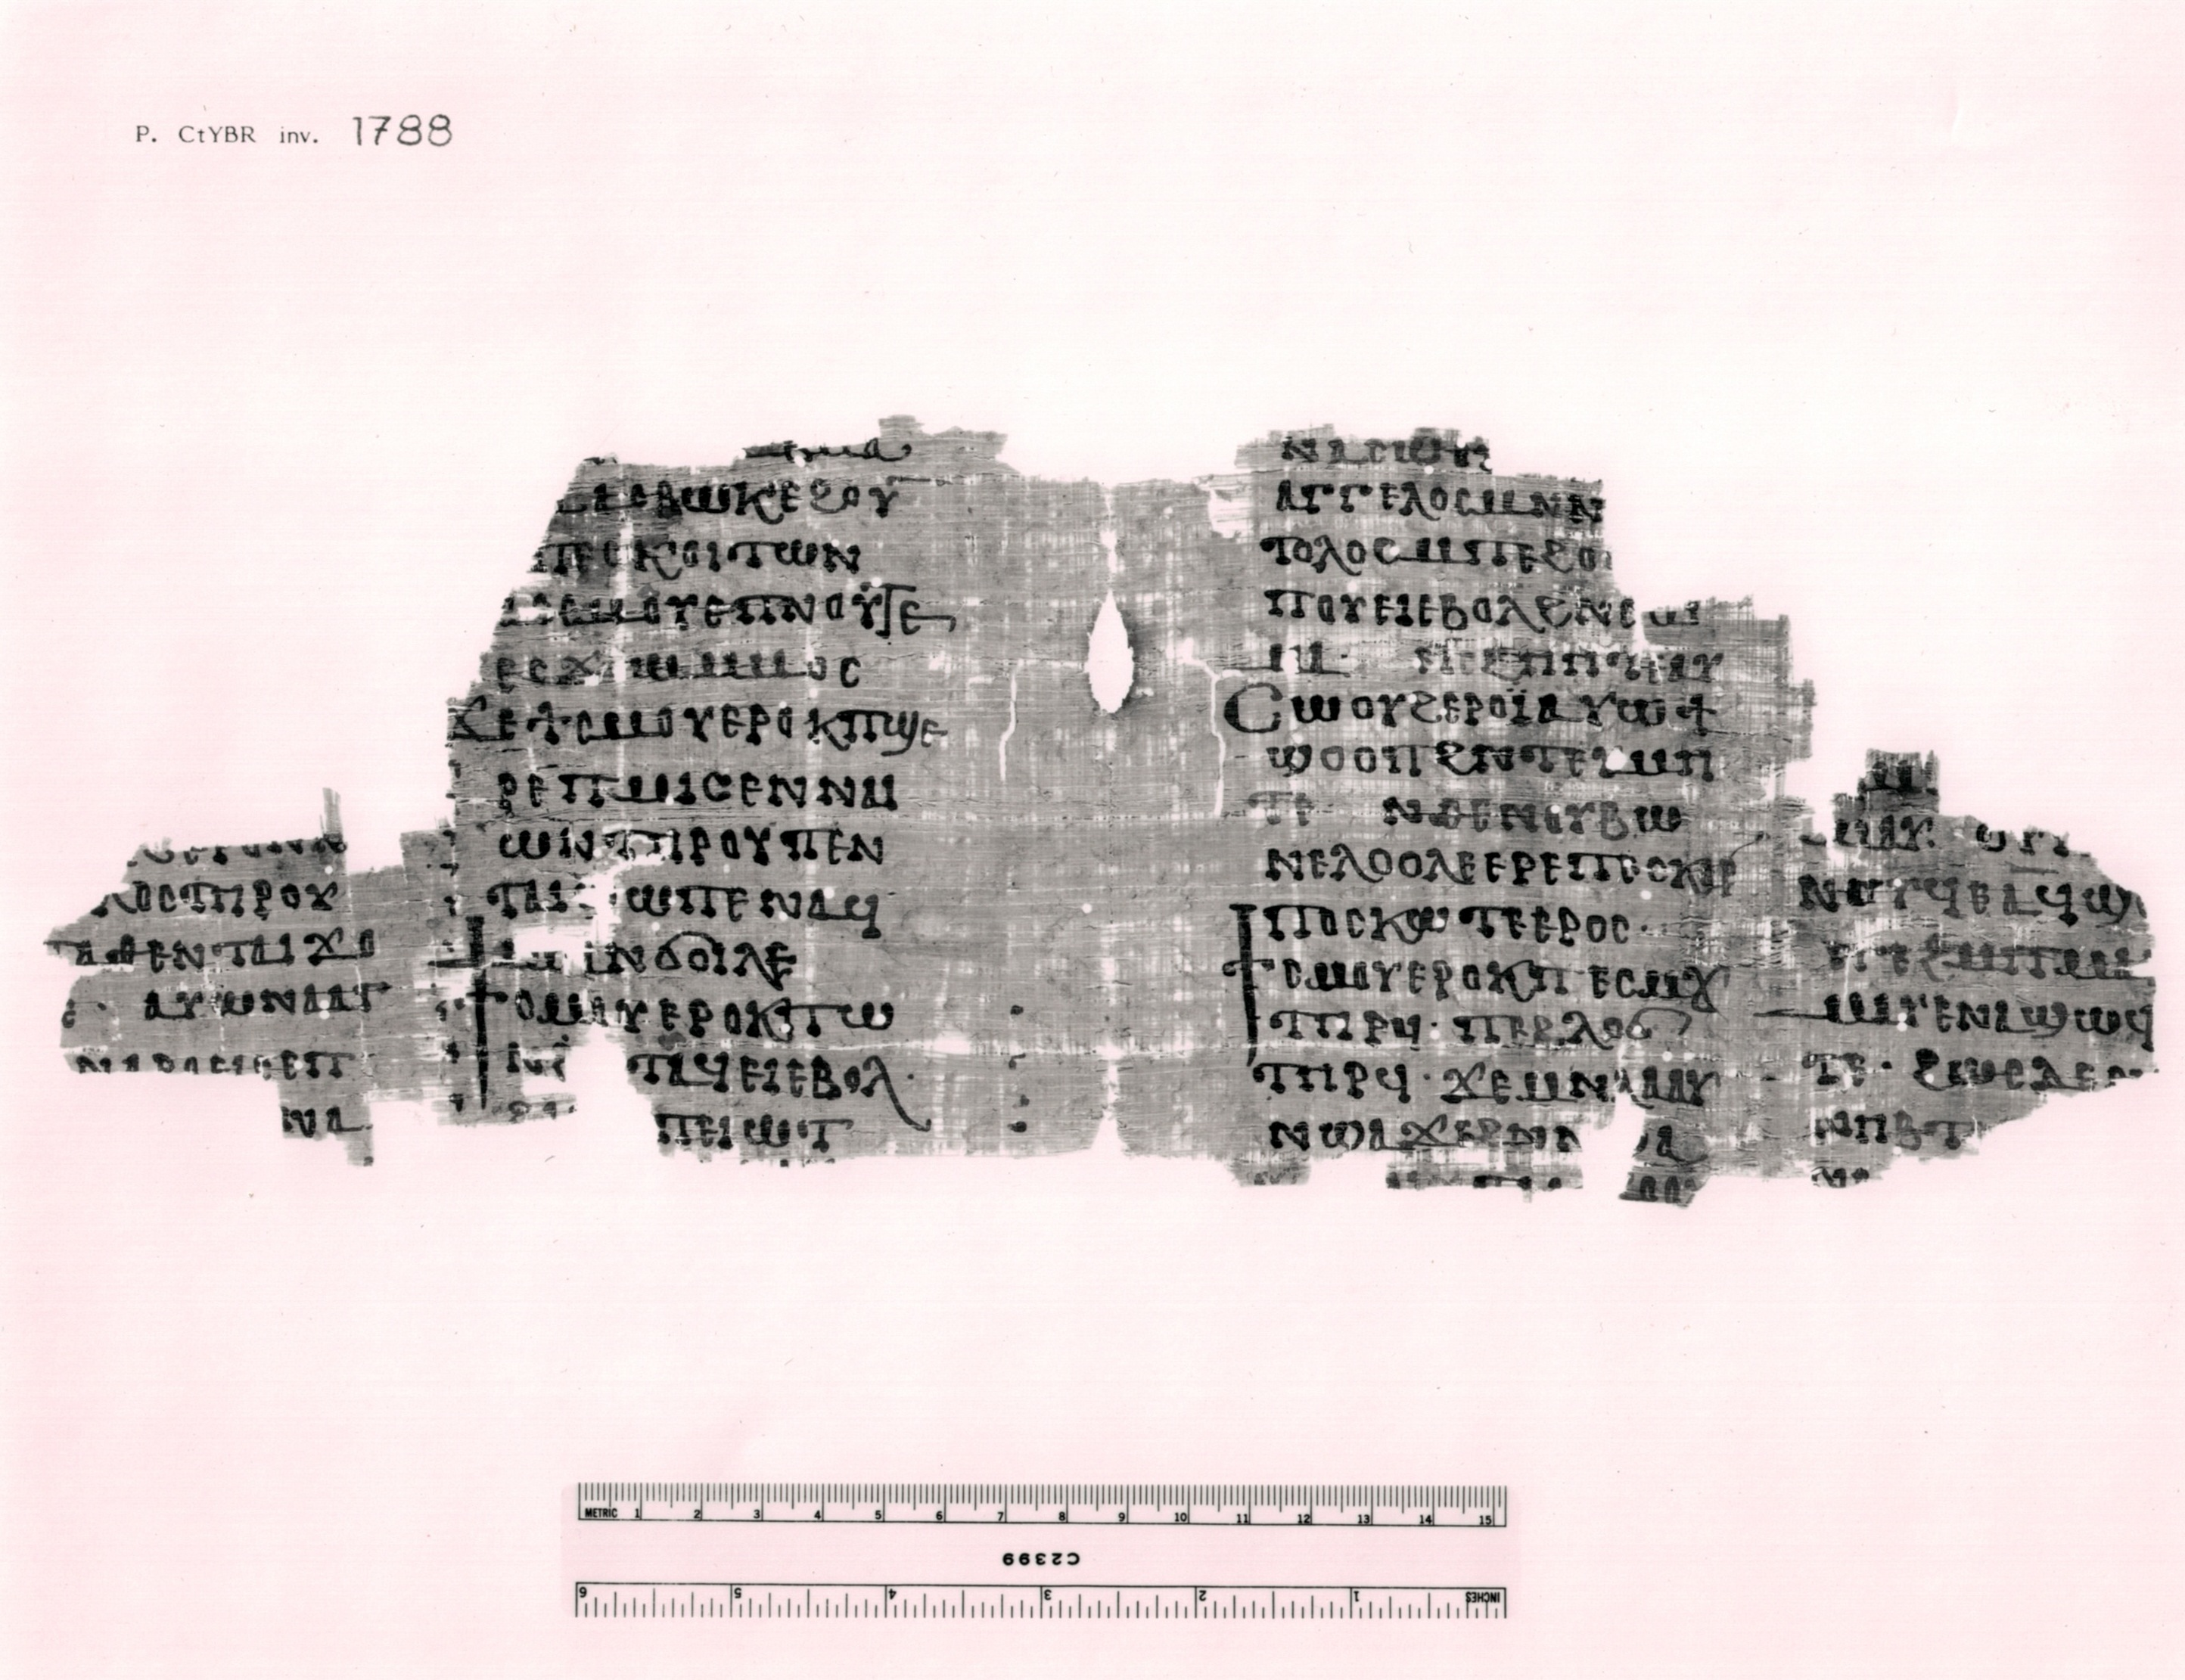 3. P.CtYBR inv. 1788.jpeg